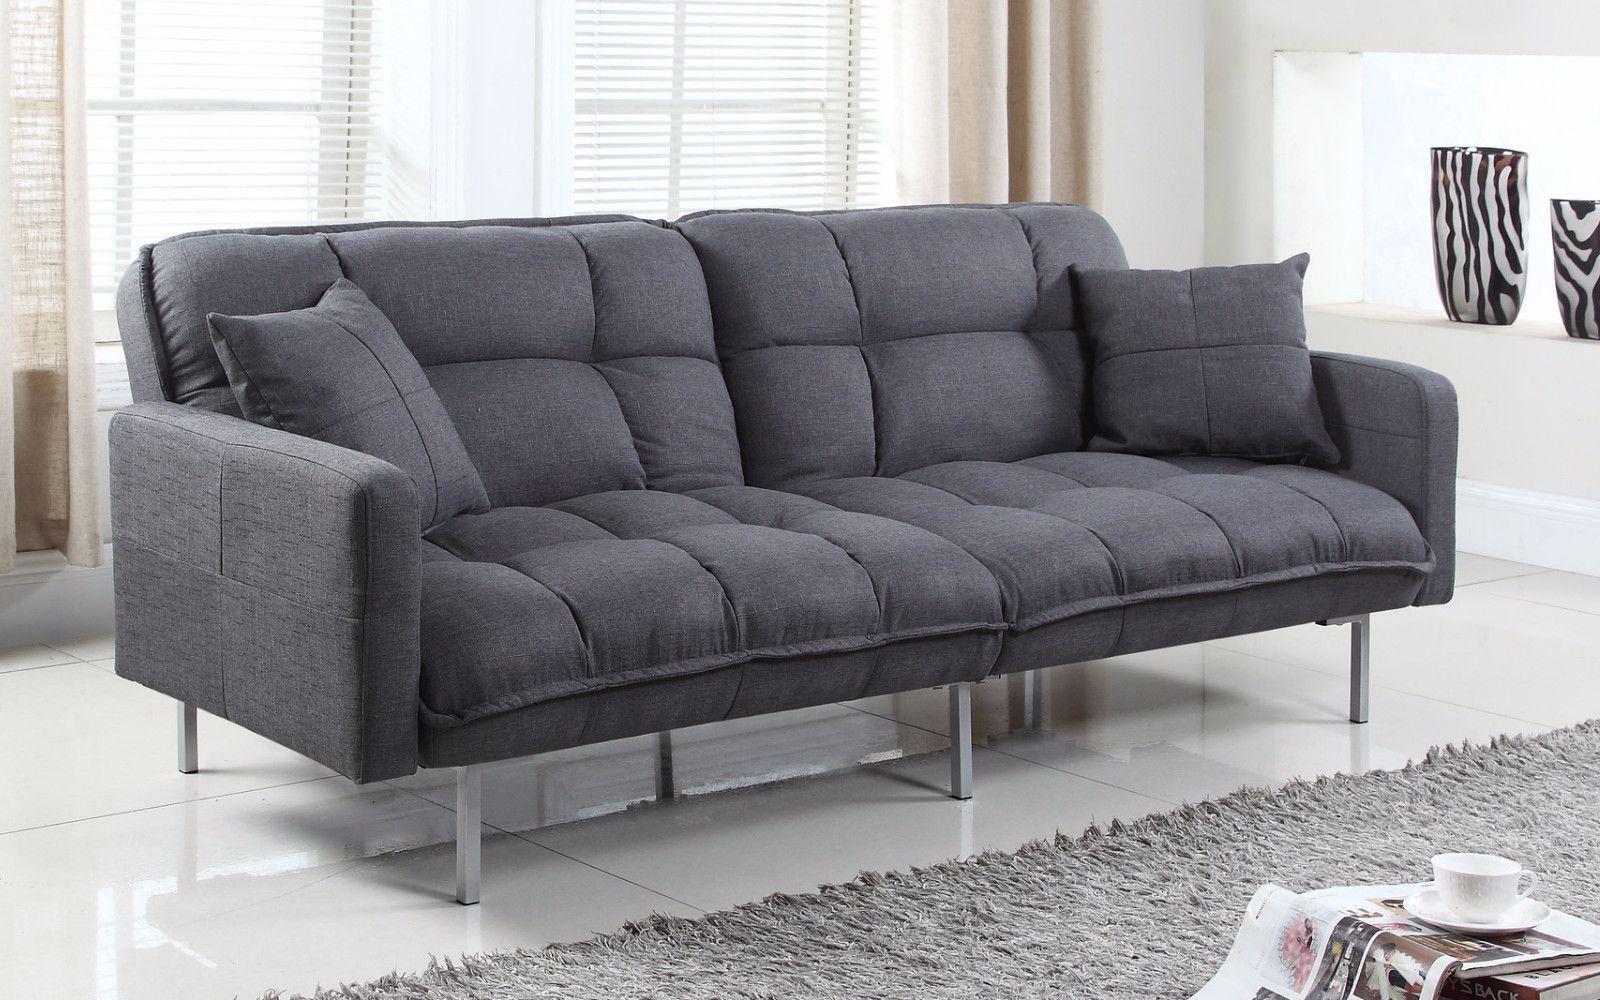 new product 12001 7f3c3 Nemo Cheery Modern Soft Linen Sleeper Futon Sofa | Products ...